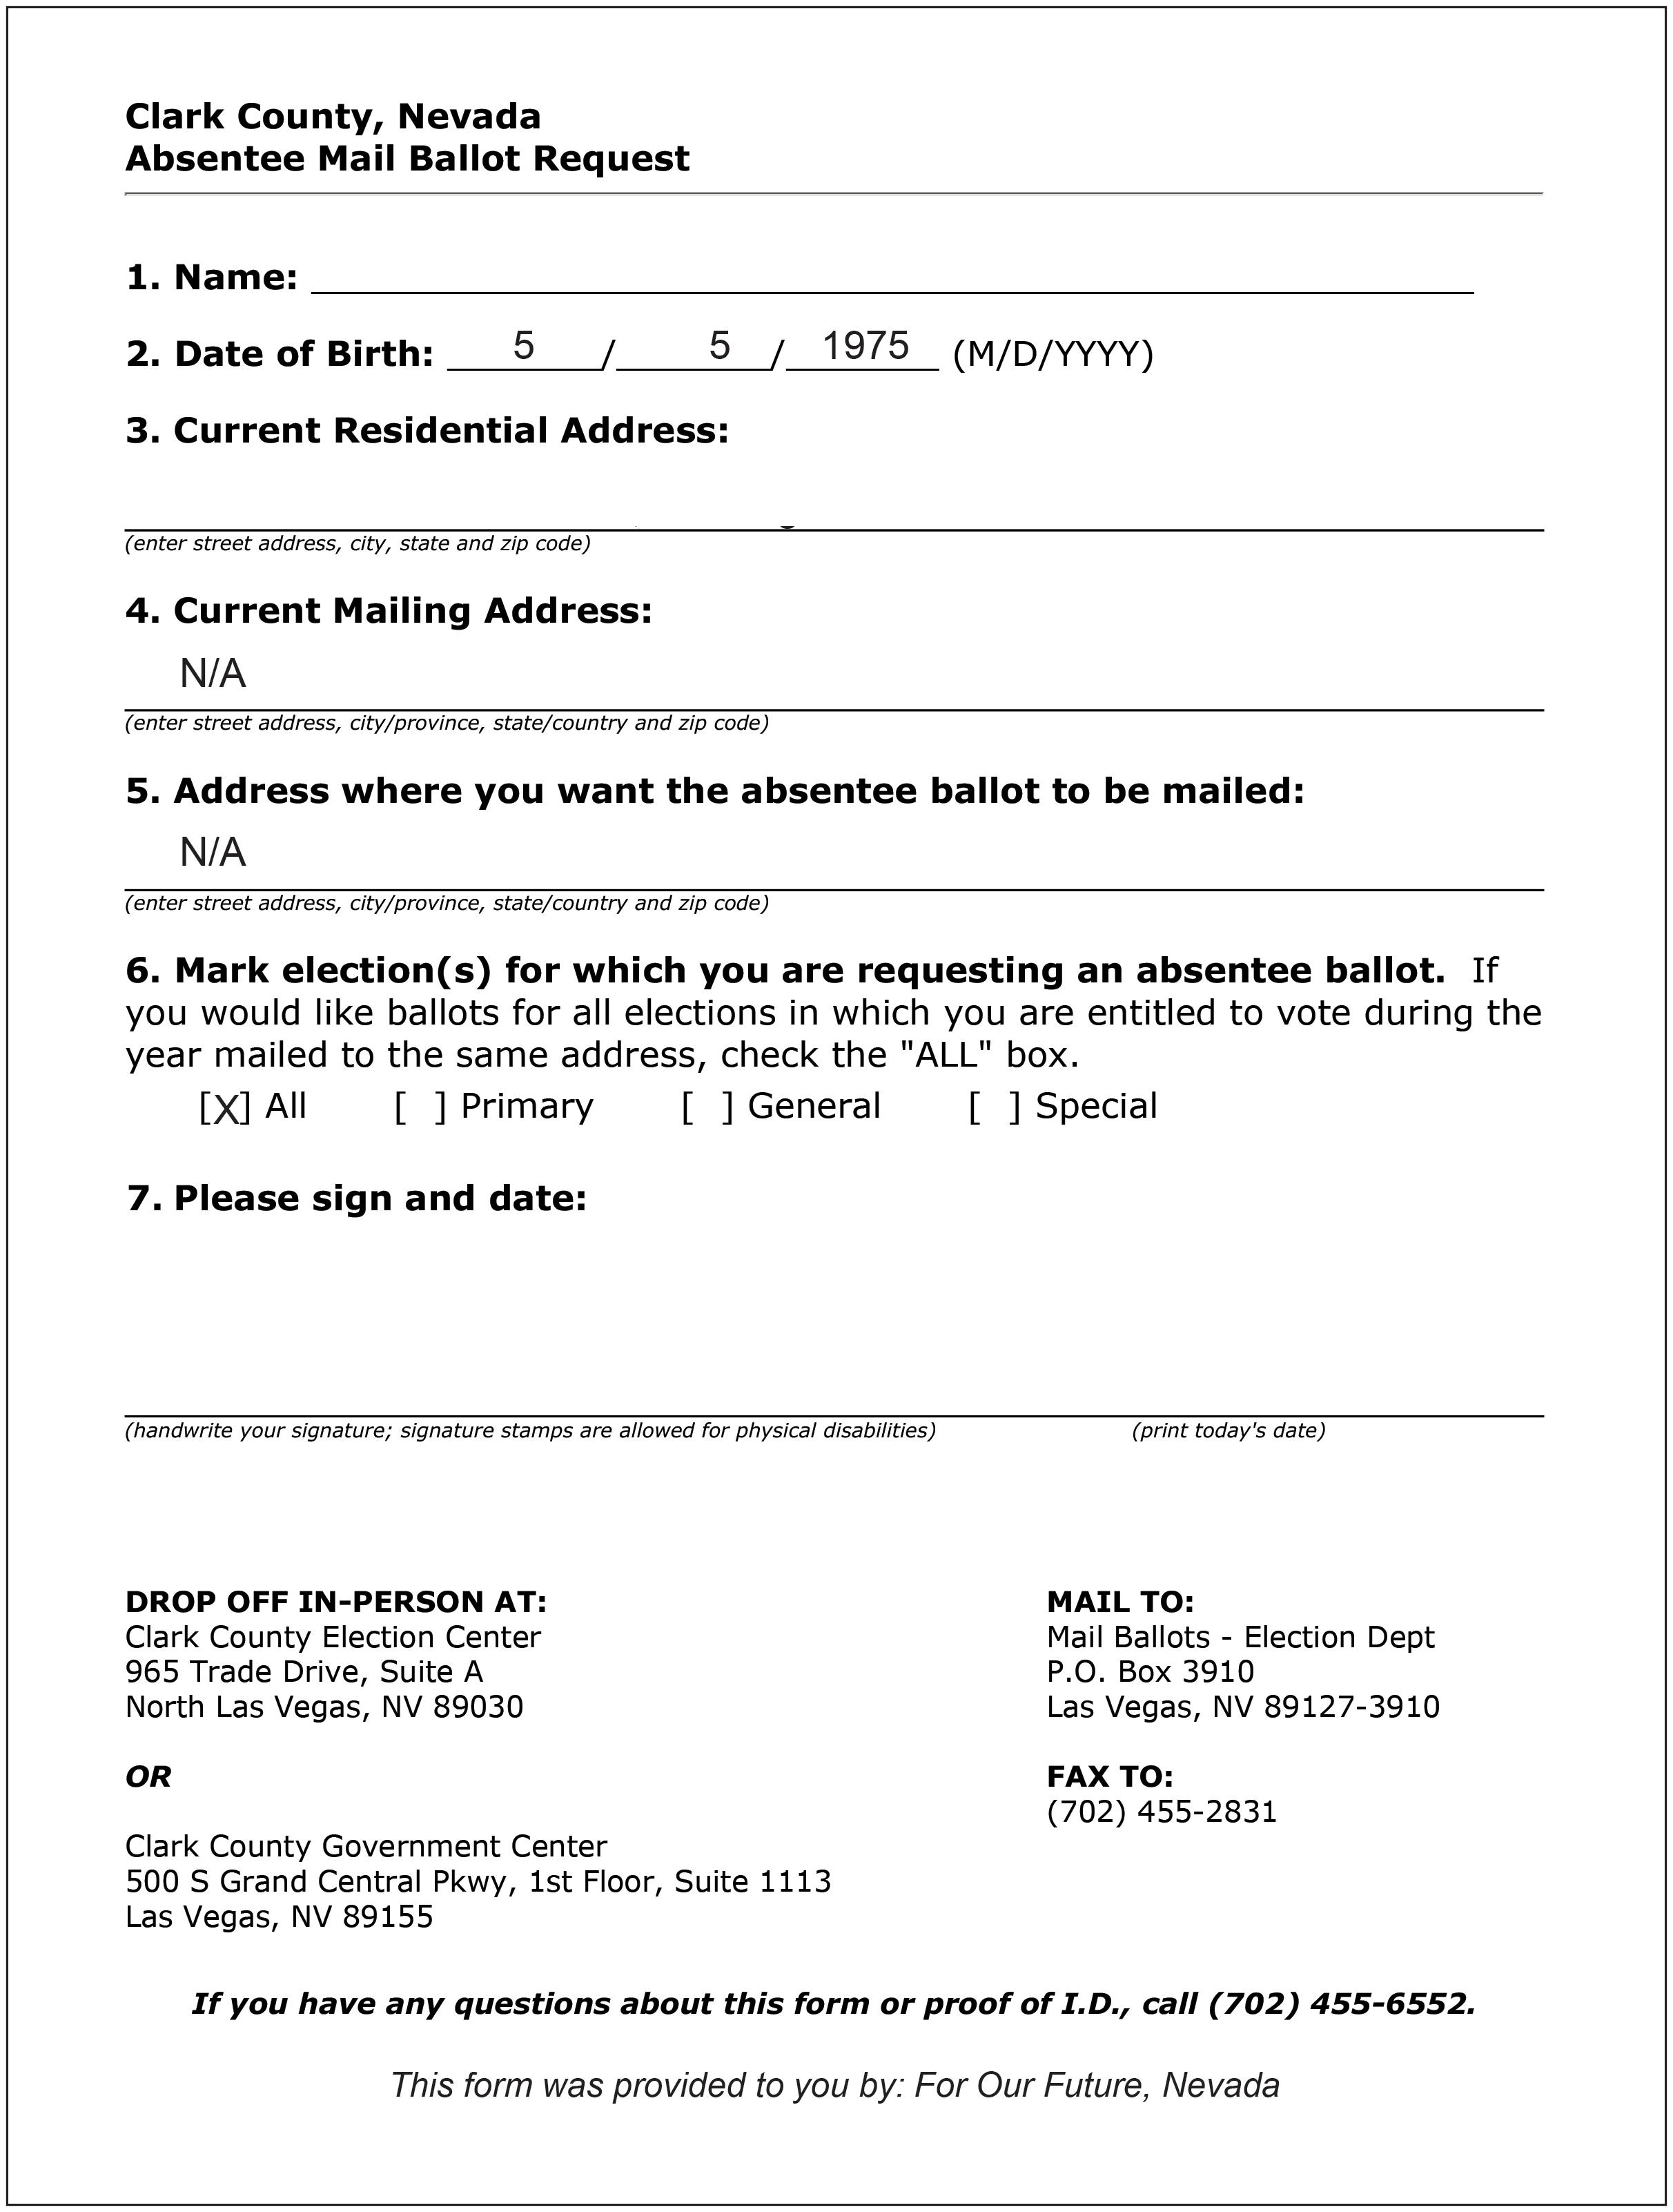 VBM Conversion Application/ FRONTSIDE